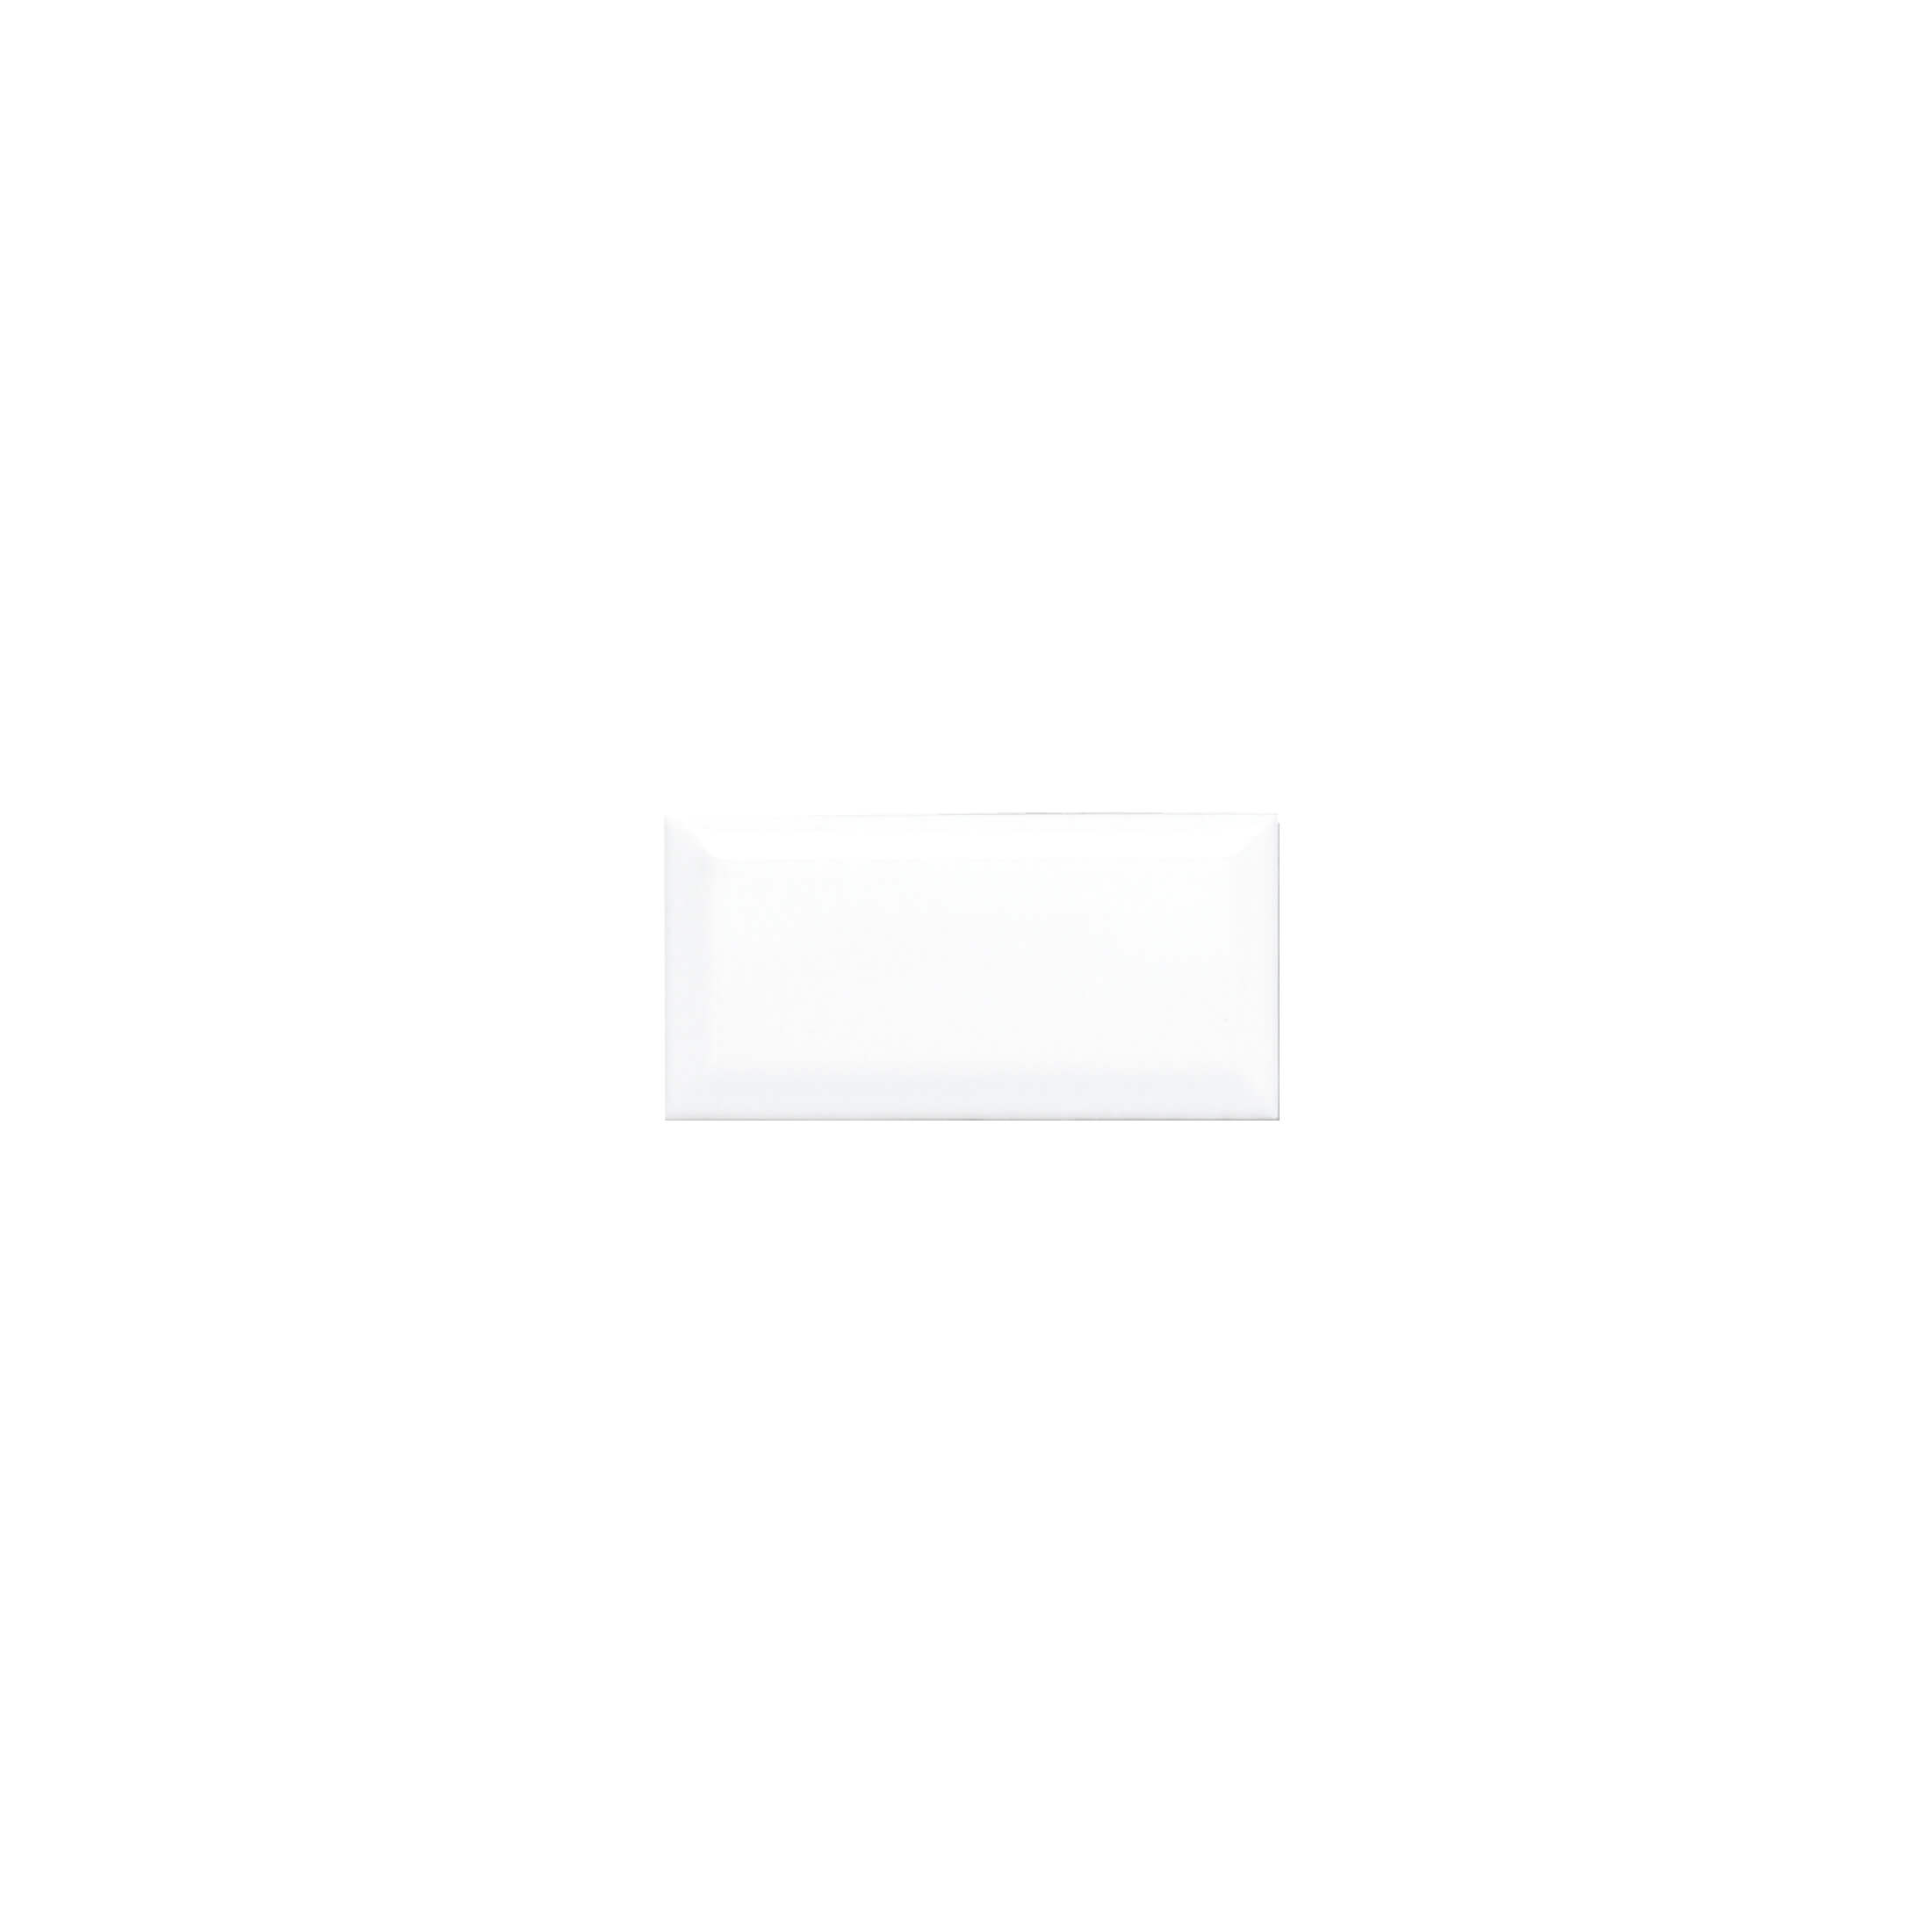 ADNE2024 - BISELADO PB - 5 cm X 10 cm